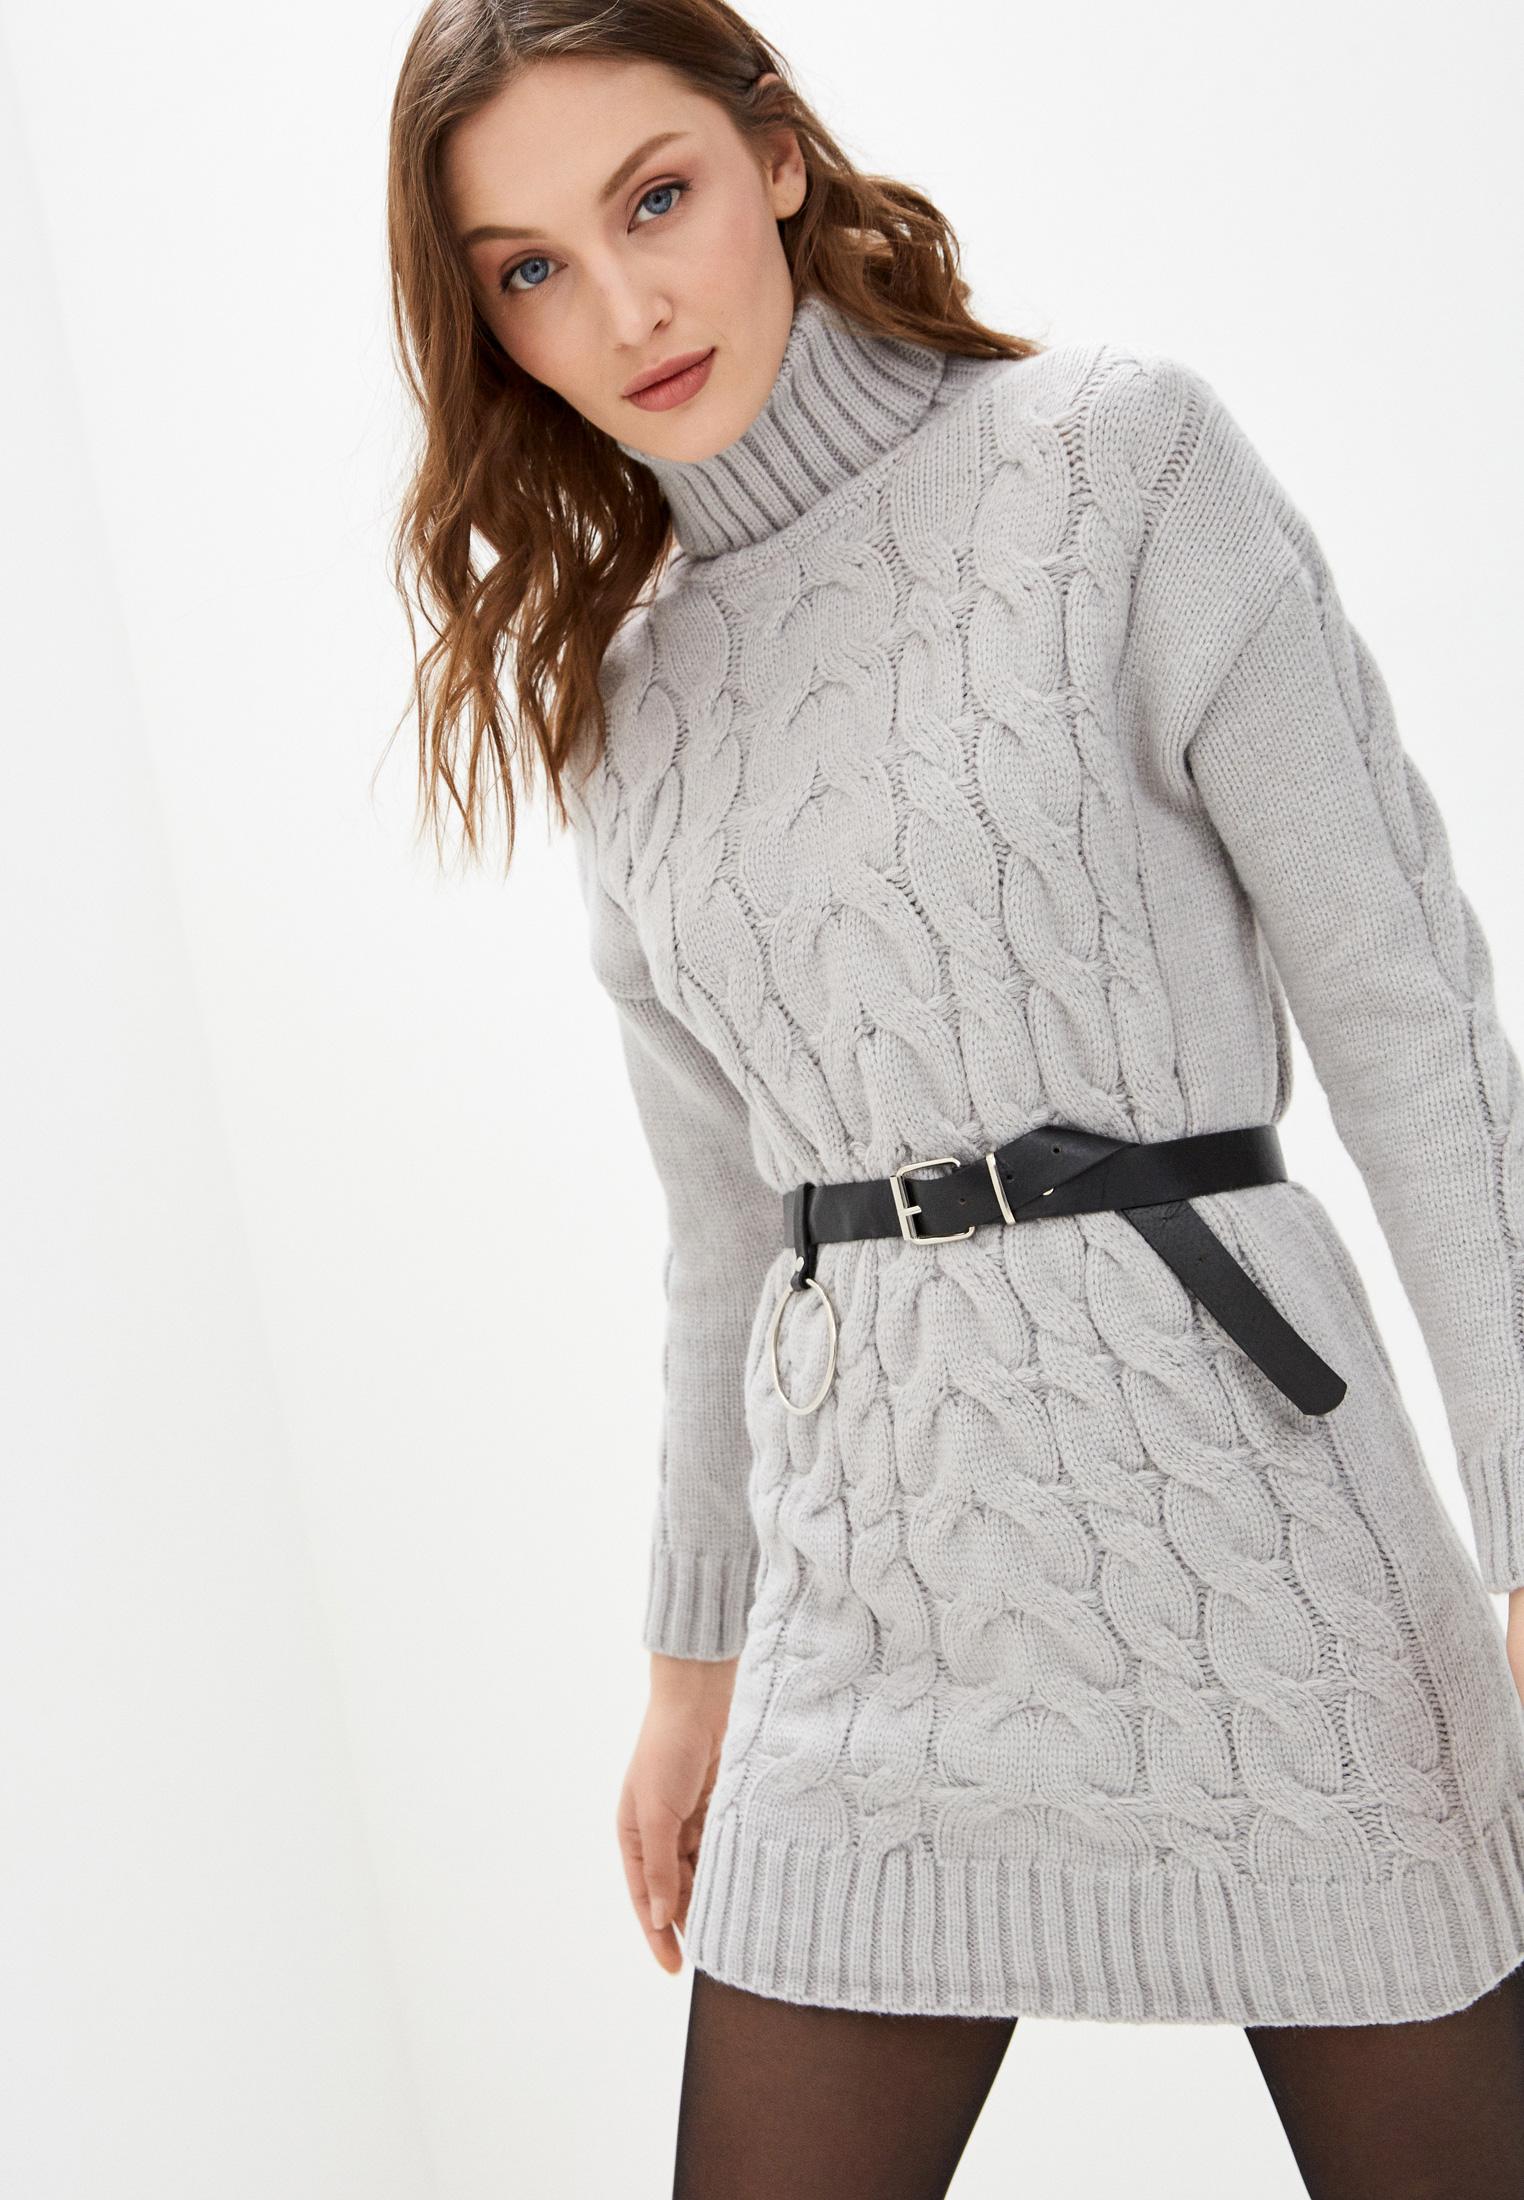 Вязаное платье Vickwool WV271-3